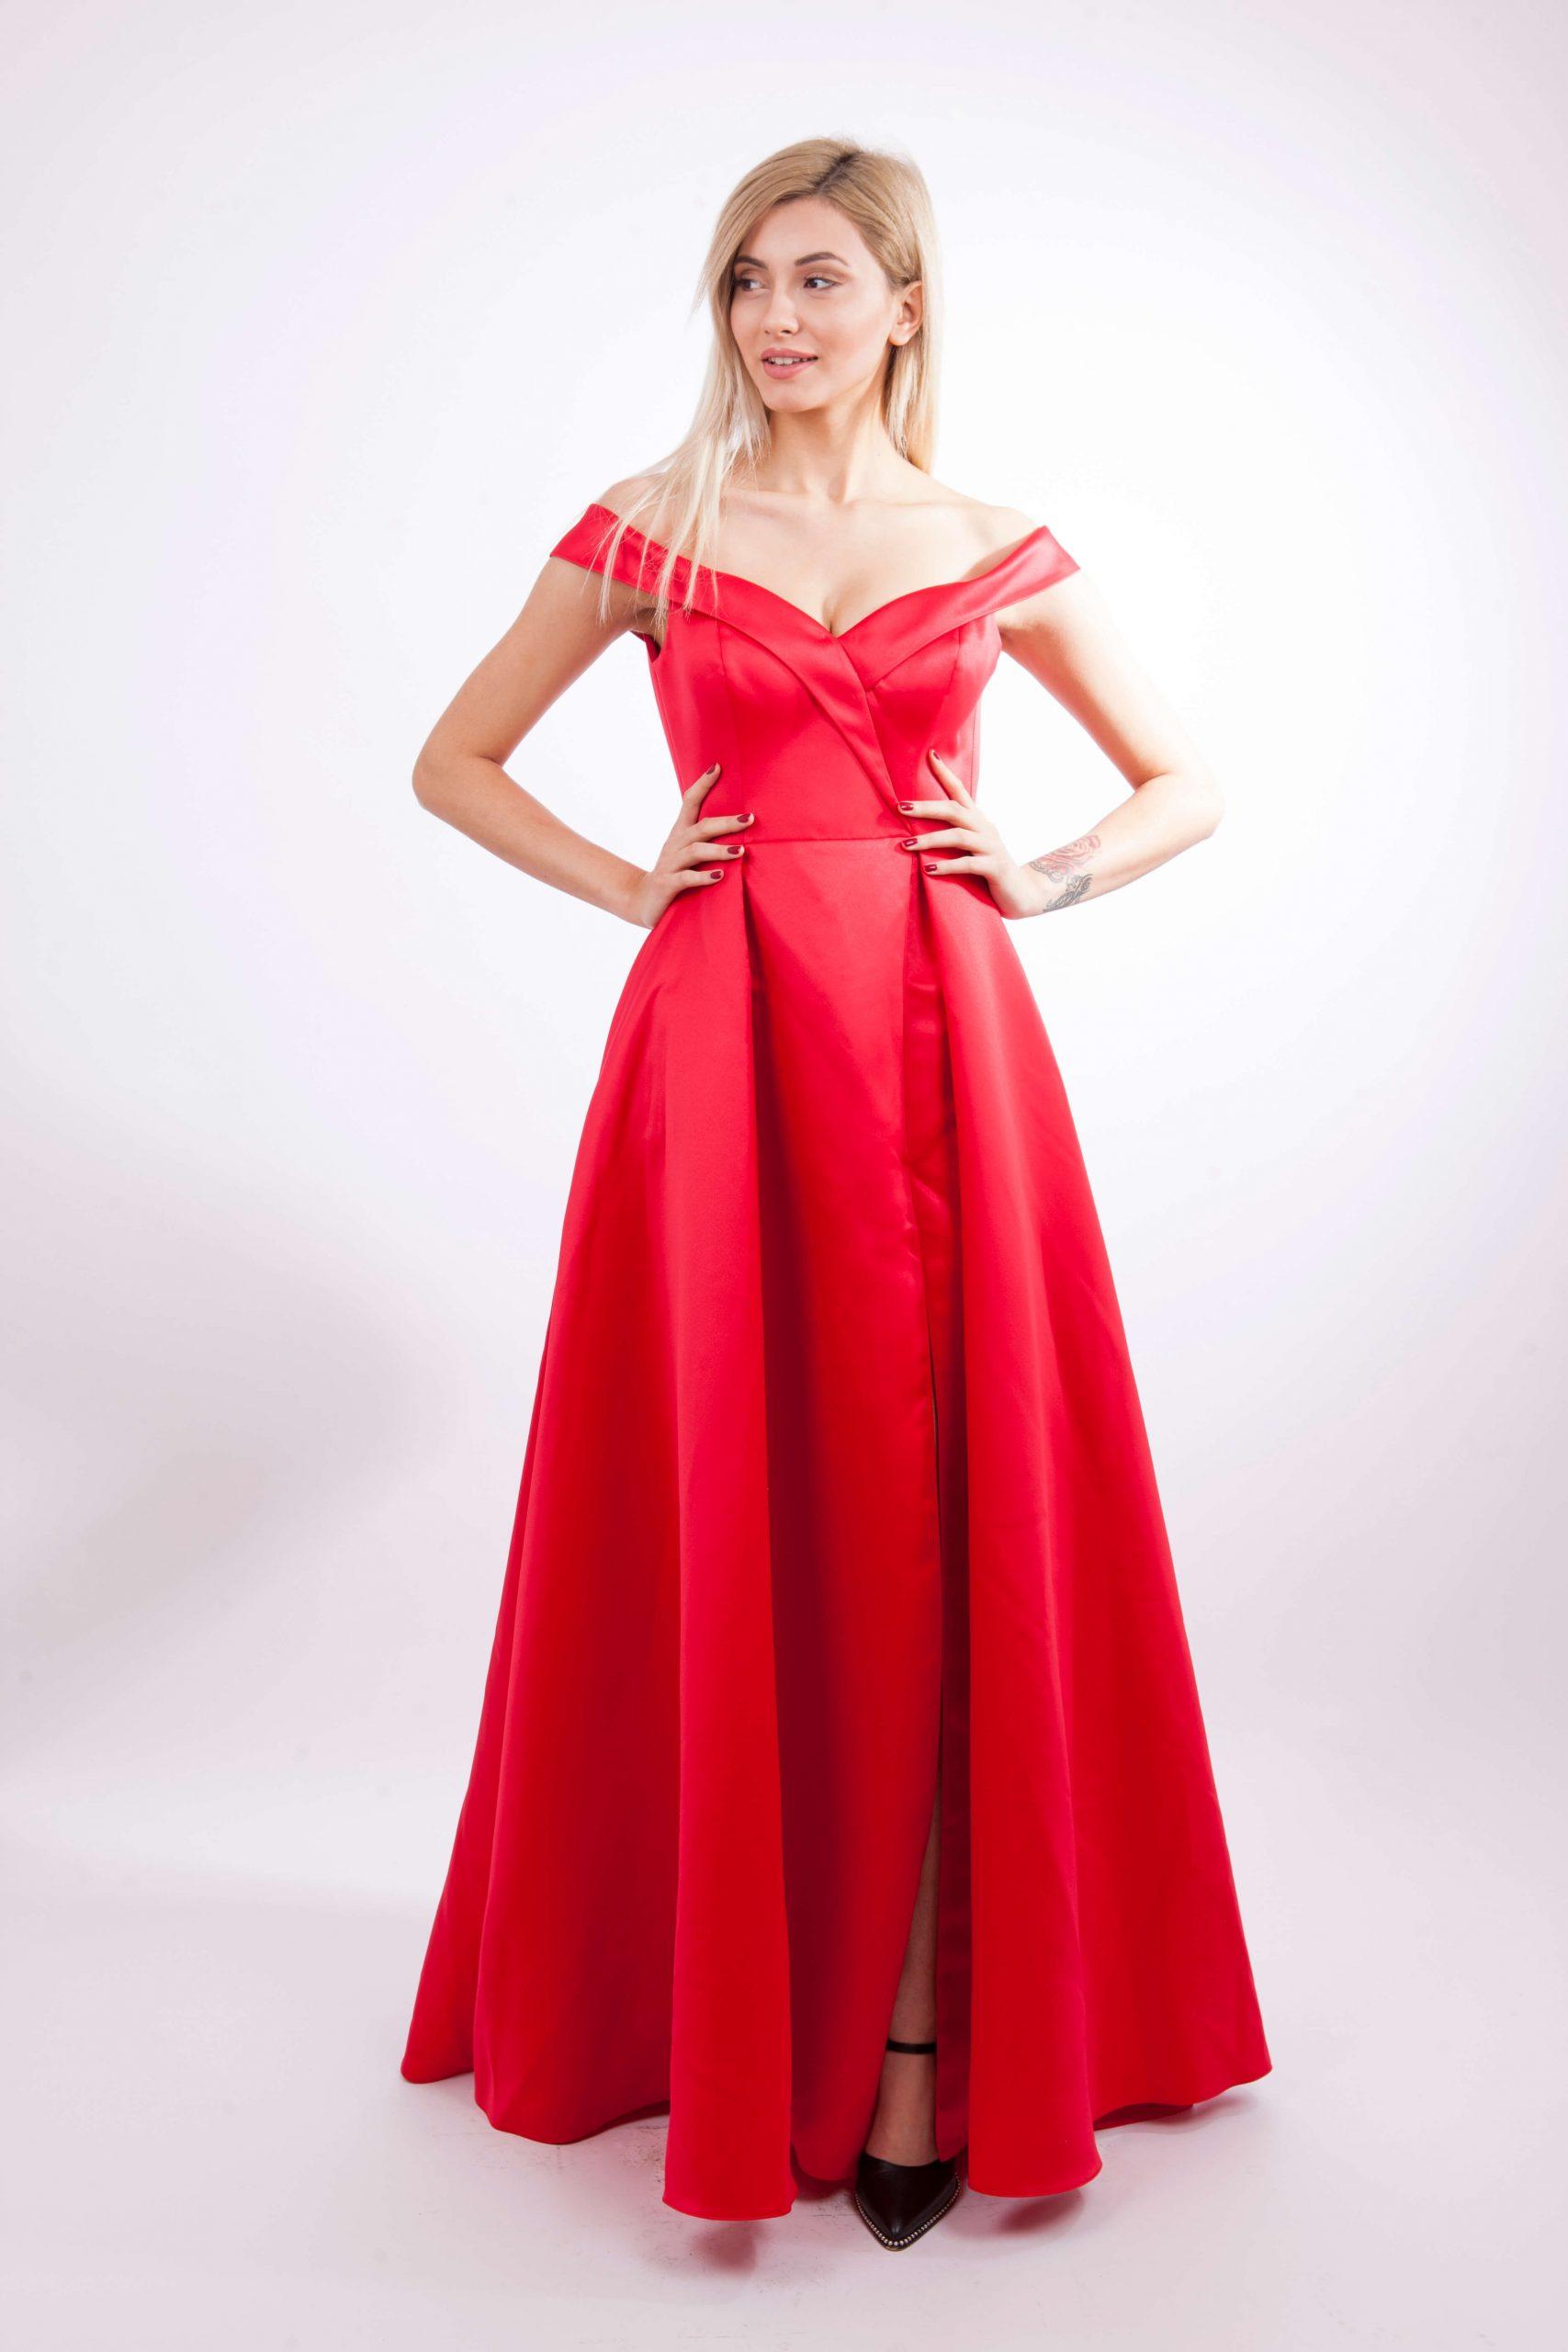 Kreativ Abendkleid Rückenausschnitt Vertrieb Genial Abendkleid Rückenausschnitt Boutique